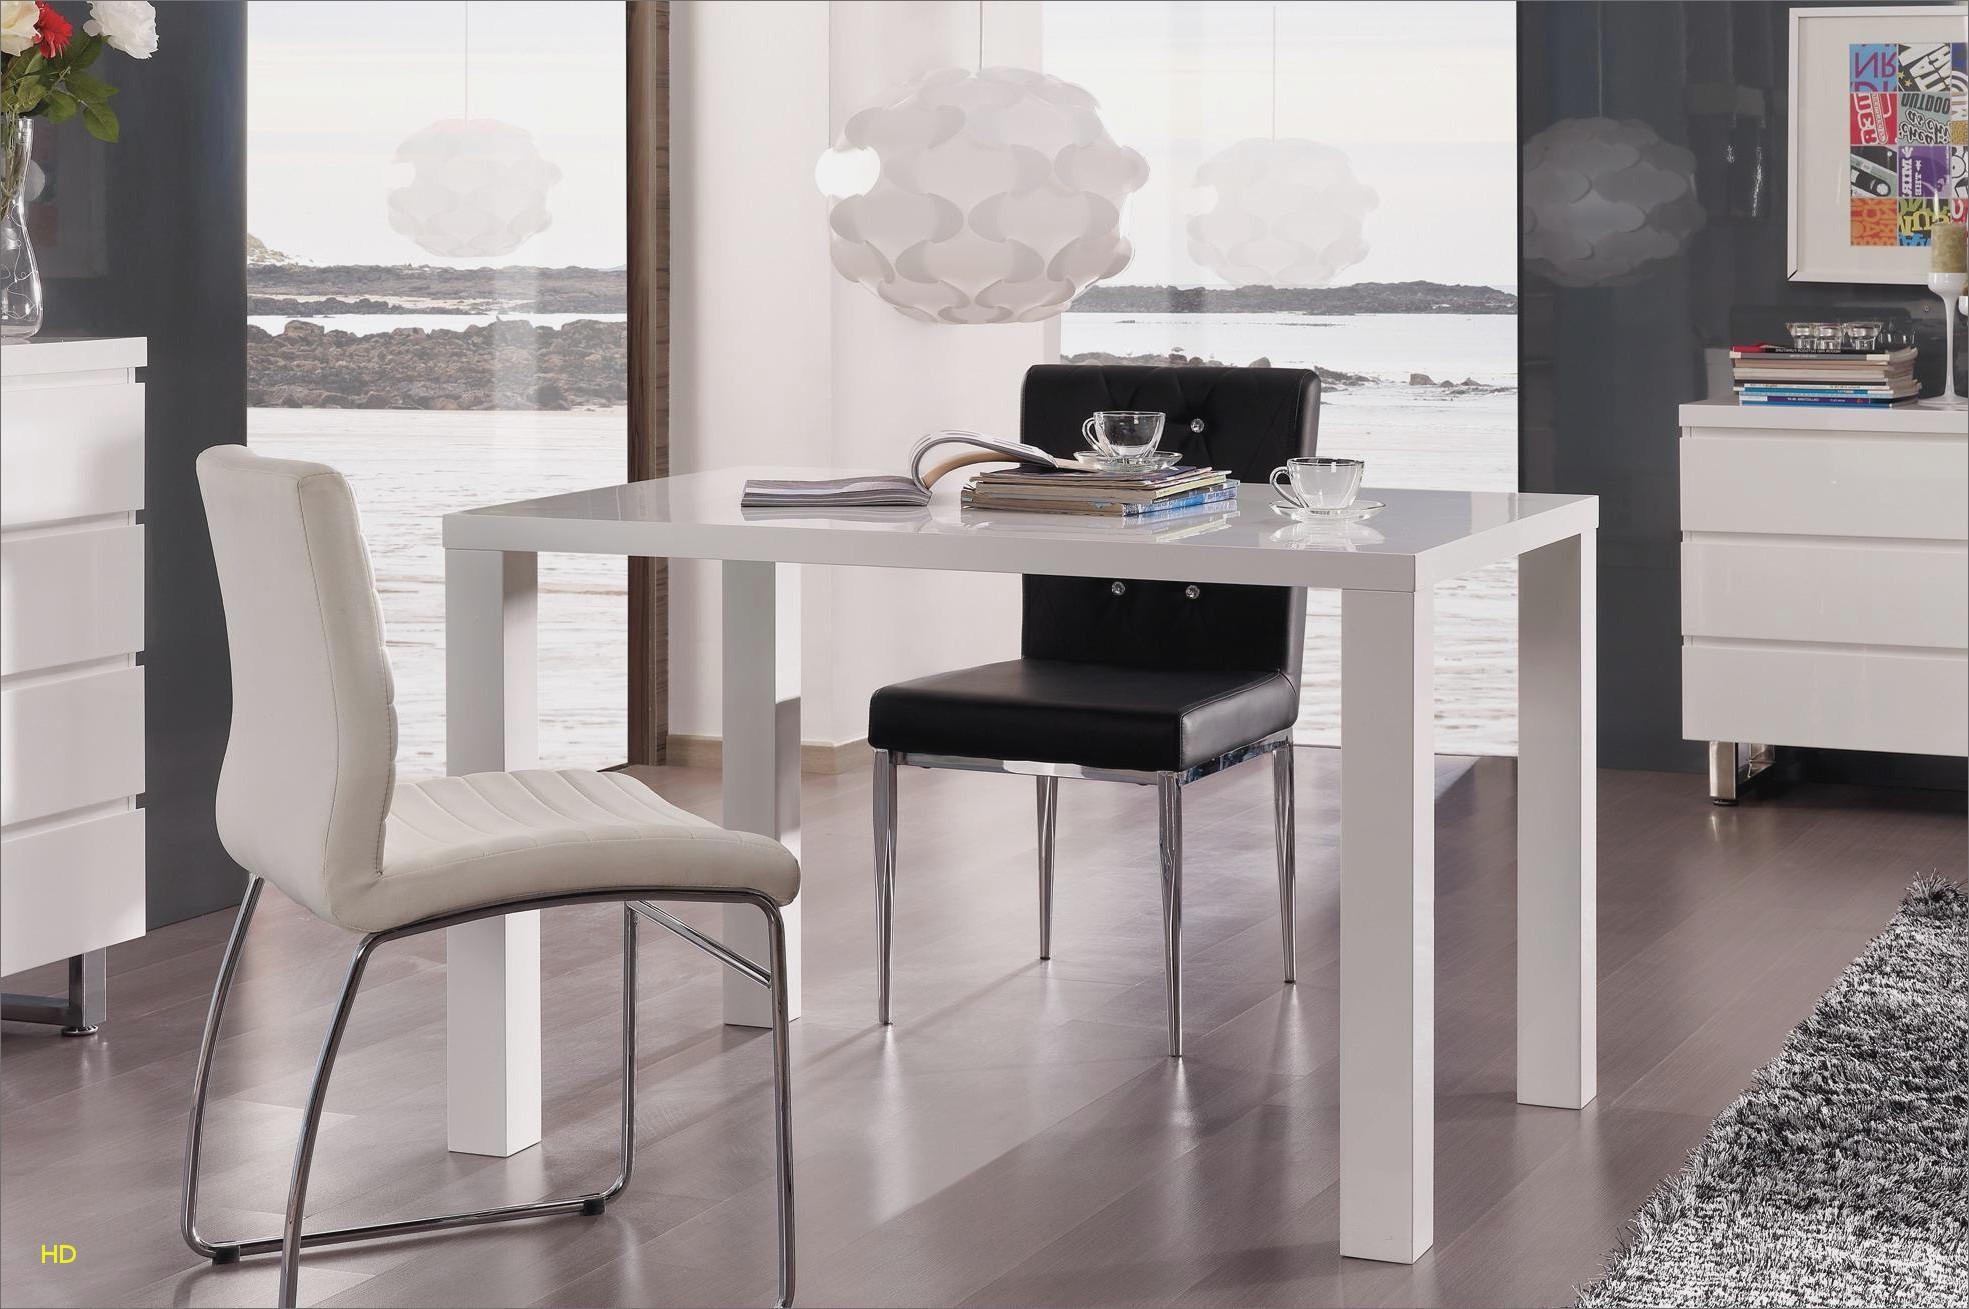 But Salle A Manger Beau Images Cuisine Moderne Design Beau Table Salle A Manger Design Unique